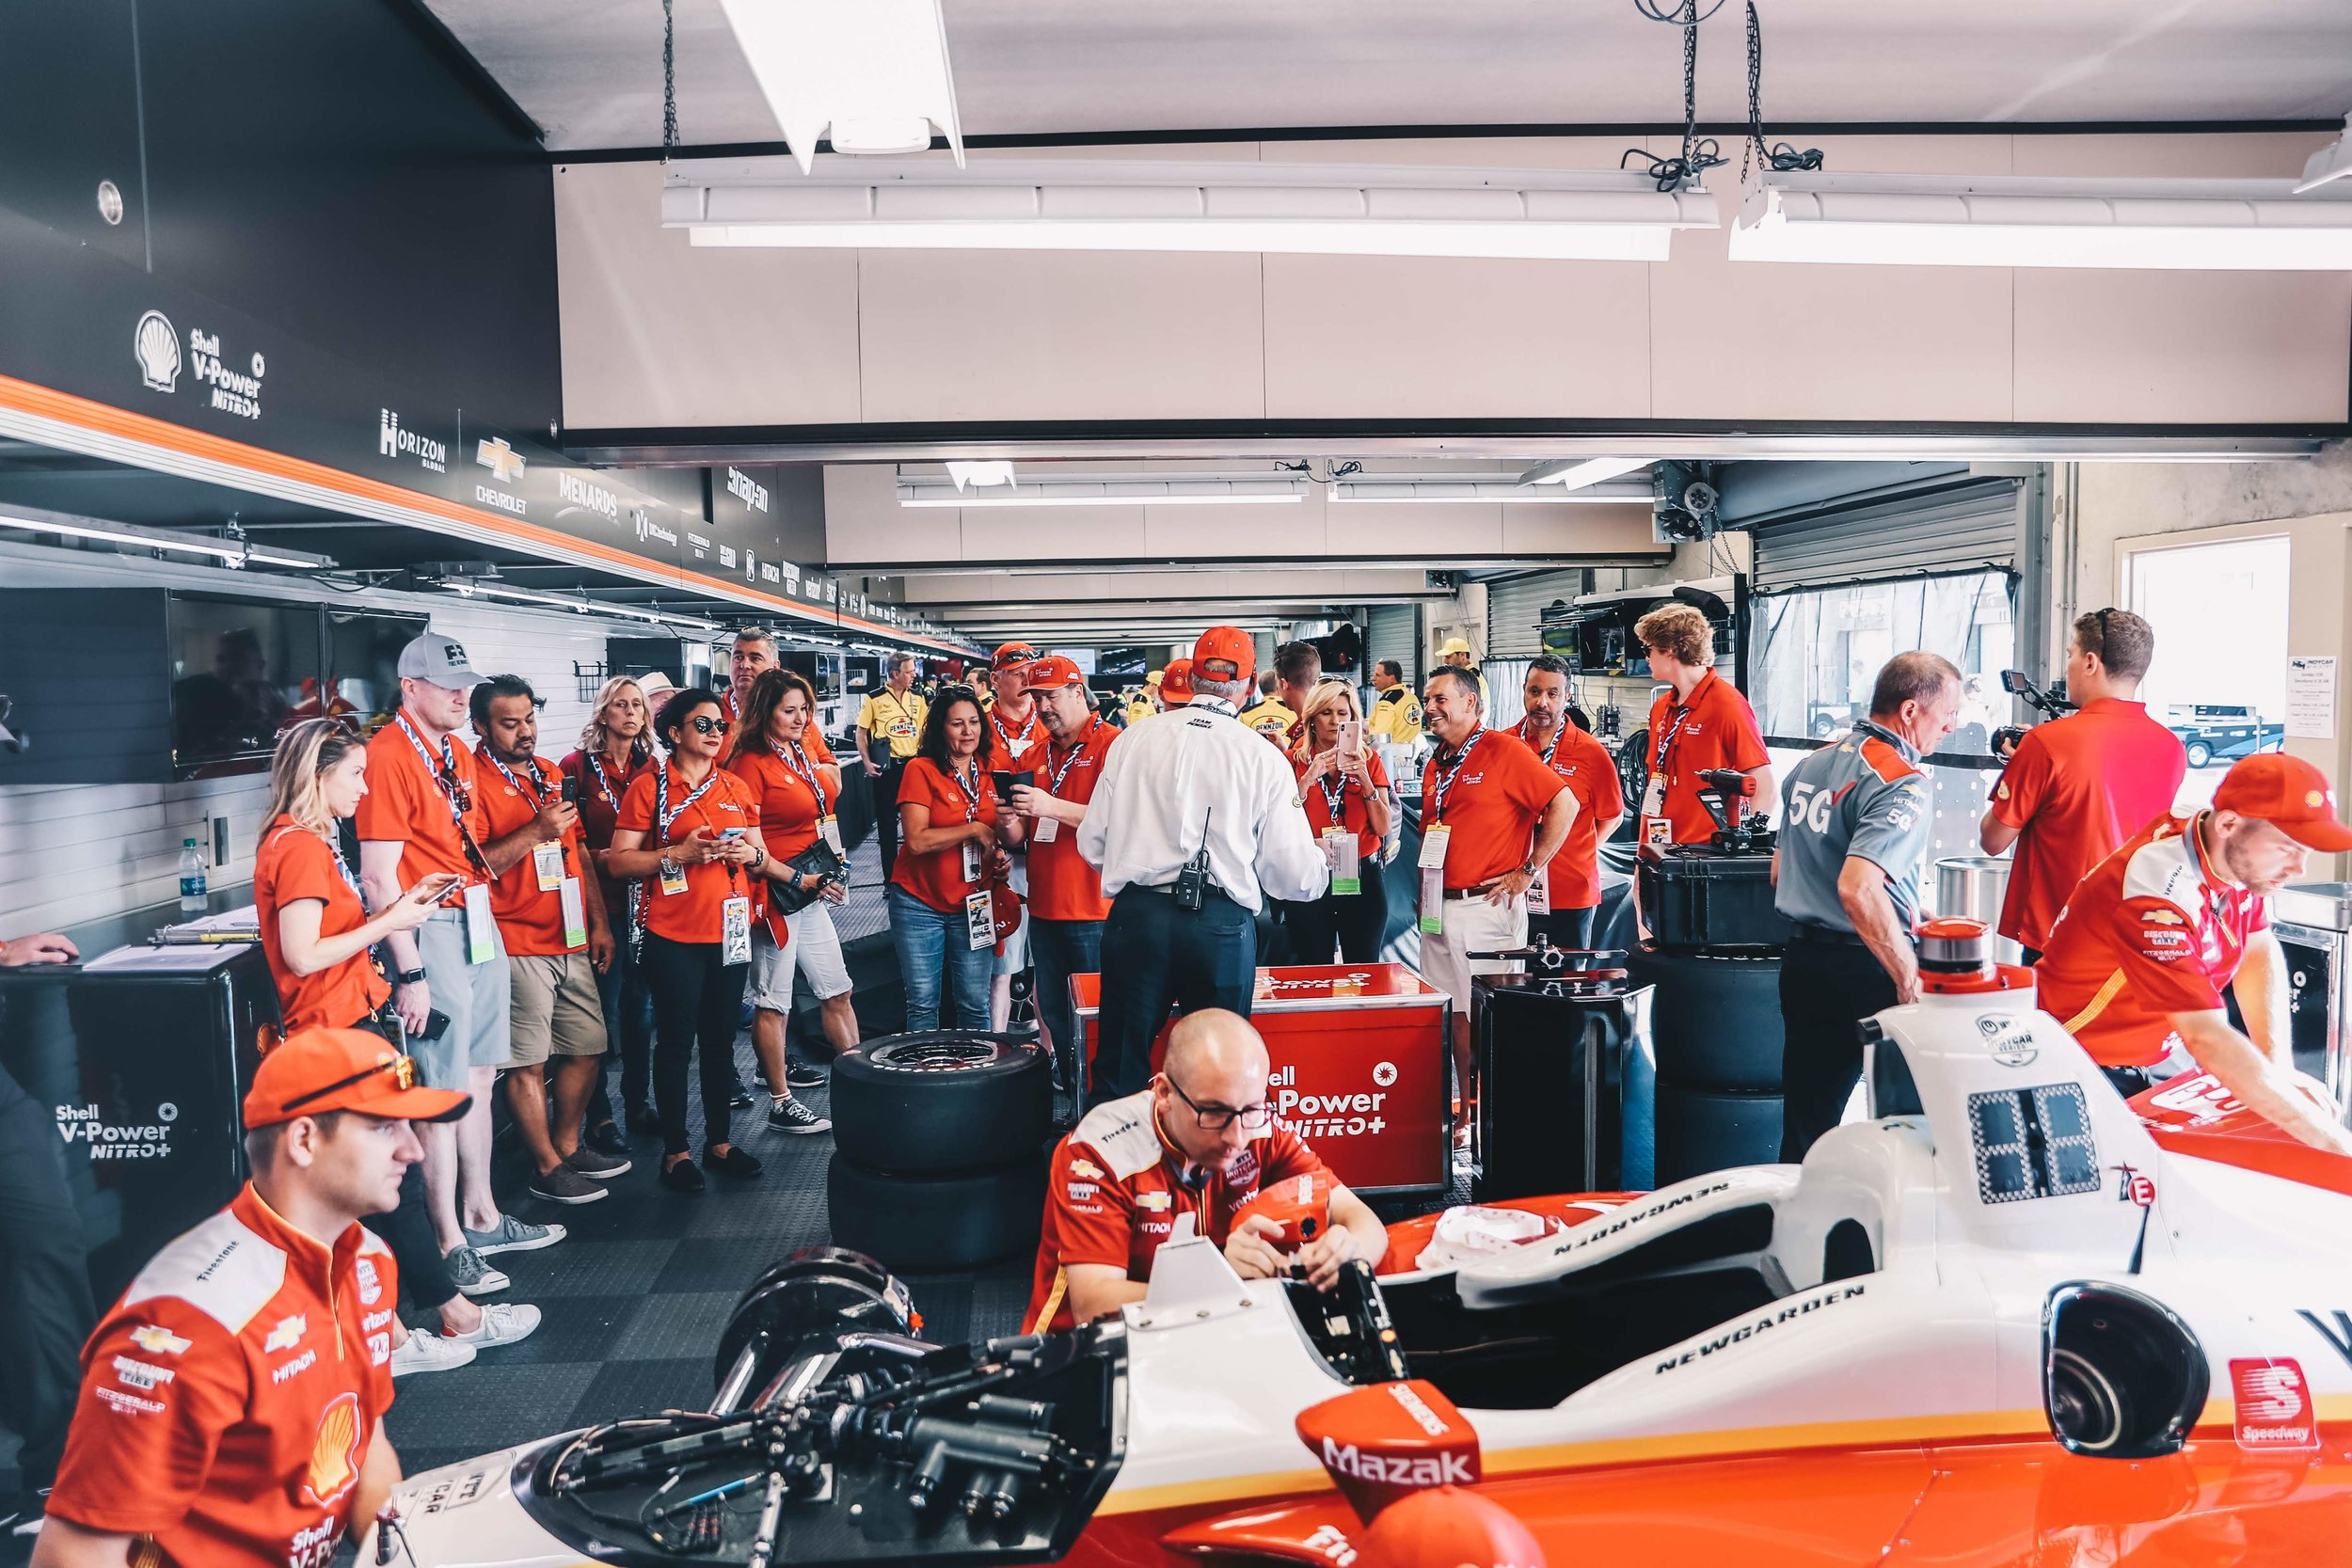 Indy 500 - May 23-26, 2019